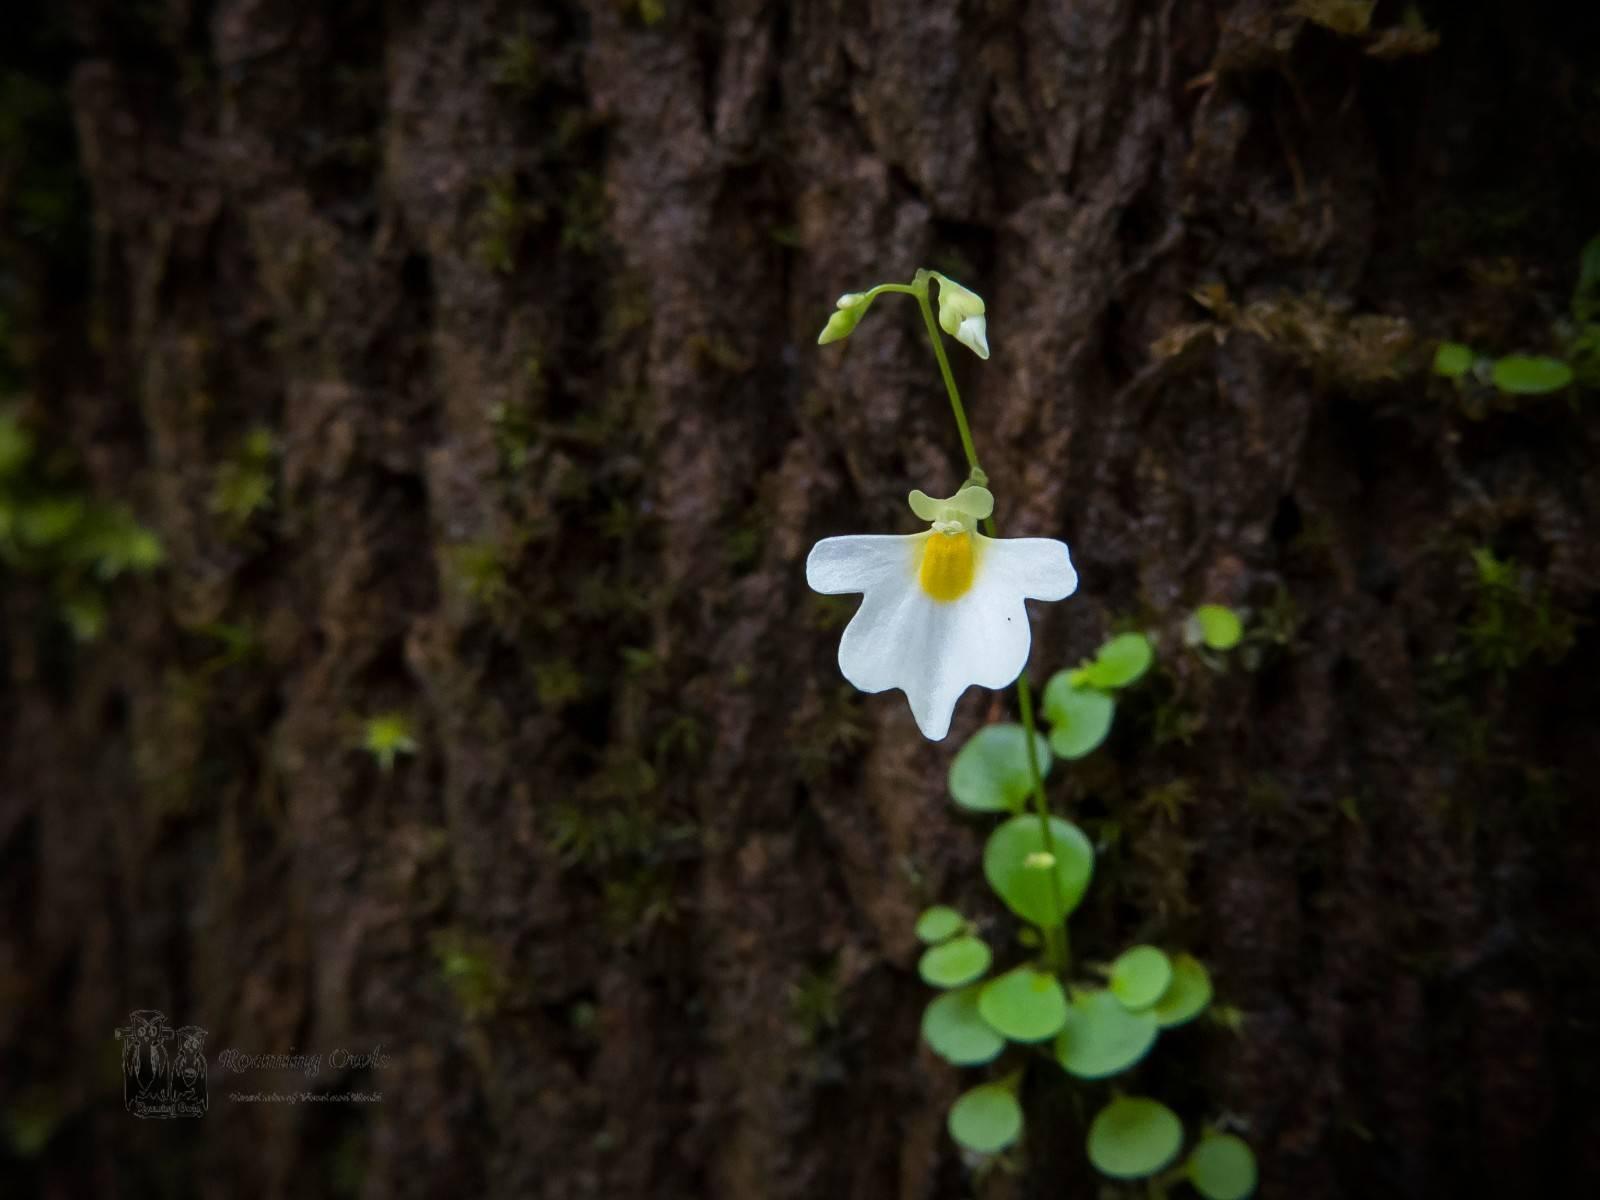 Utricularia striatula,striped bladderwort,kaas wildflower,utricularia faded,carnivorous plant